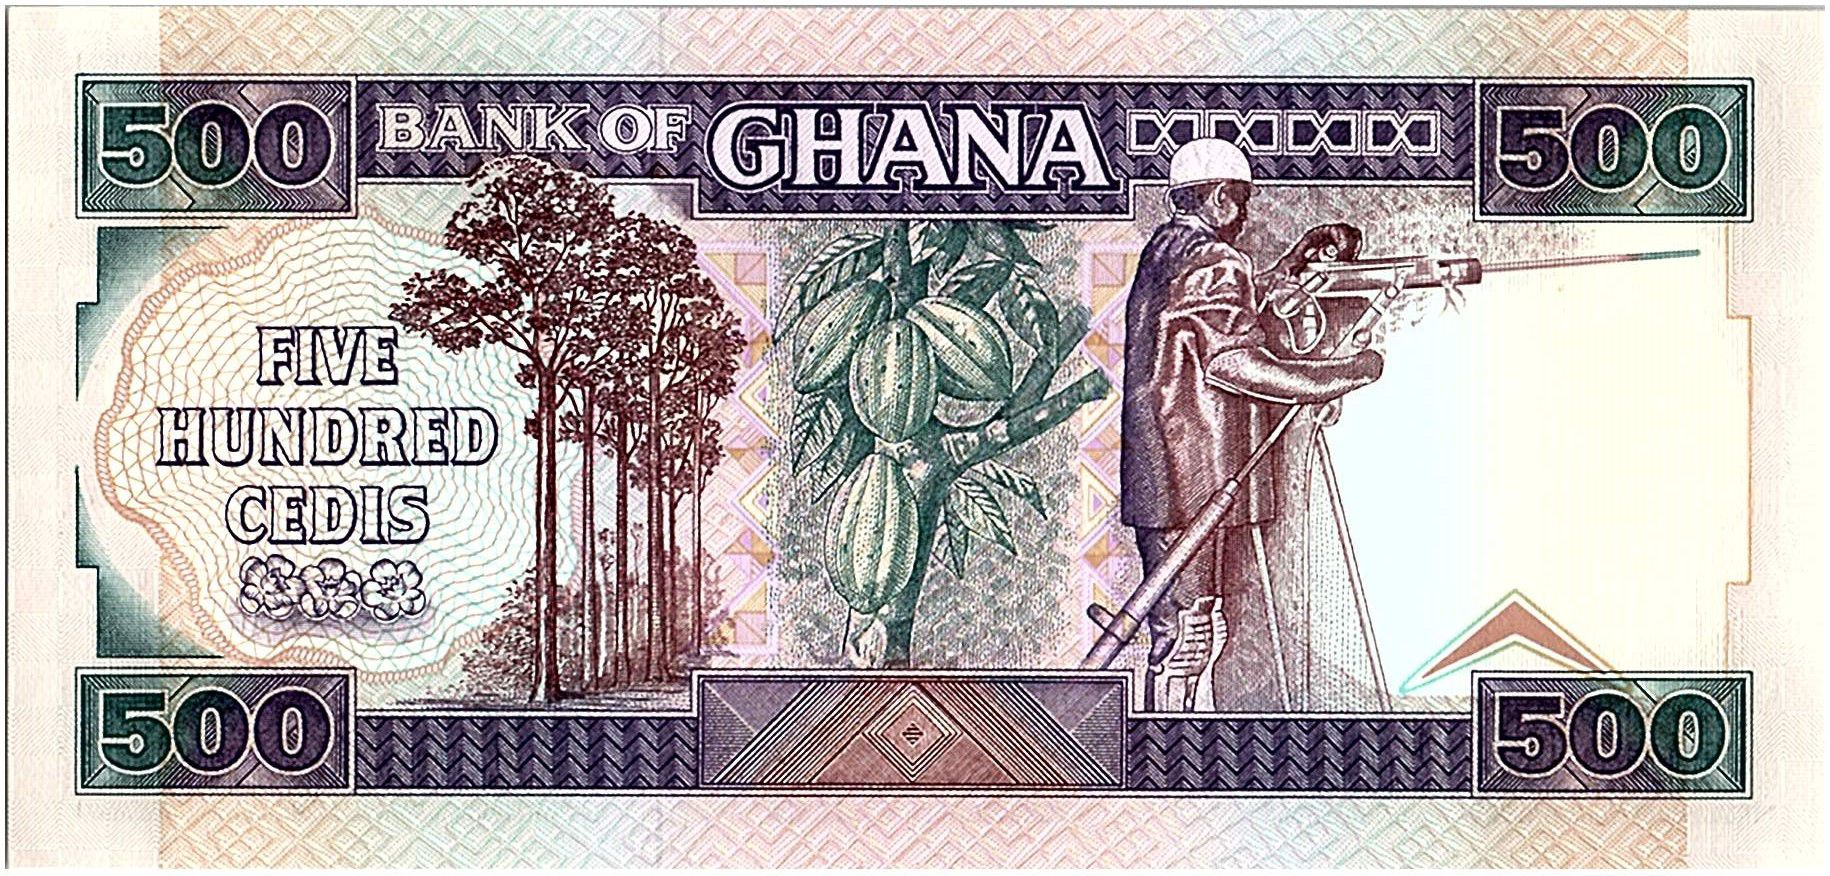 Ghana 500 Cedis - Work and Industry - 1991